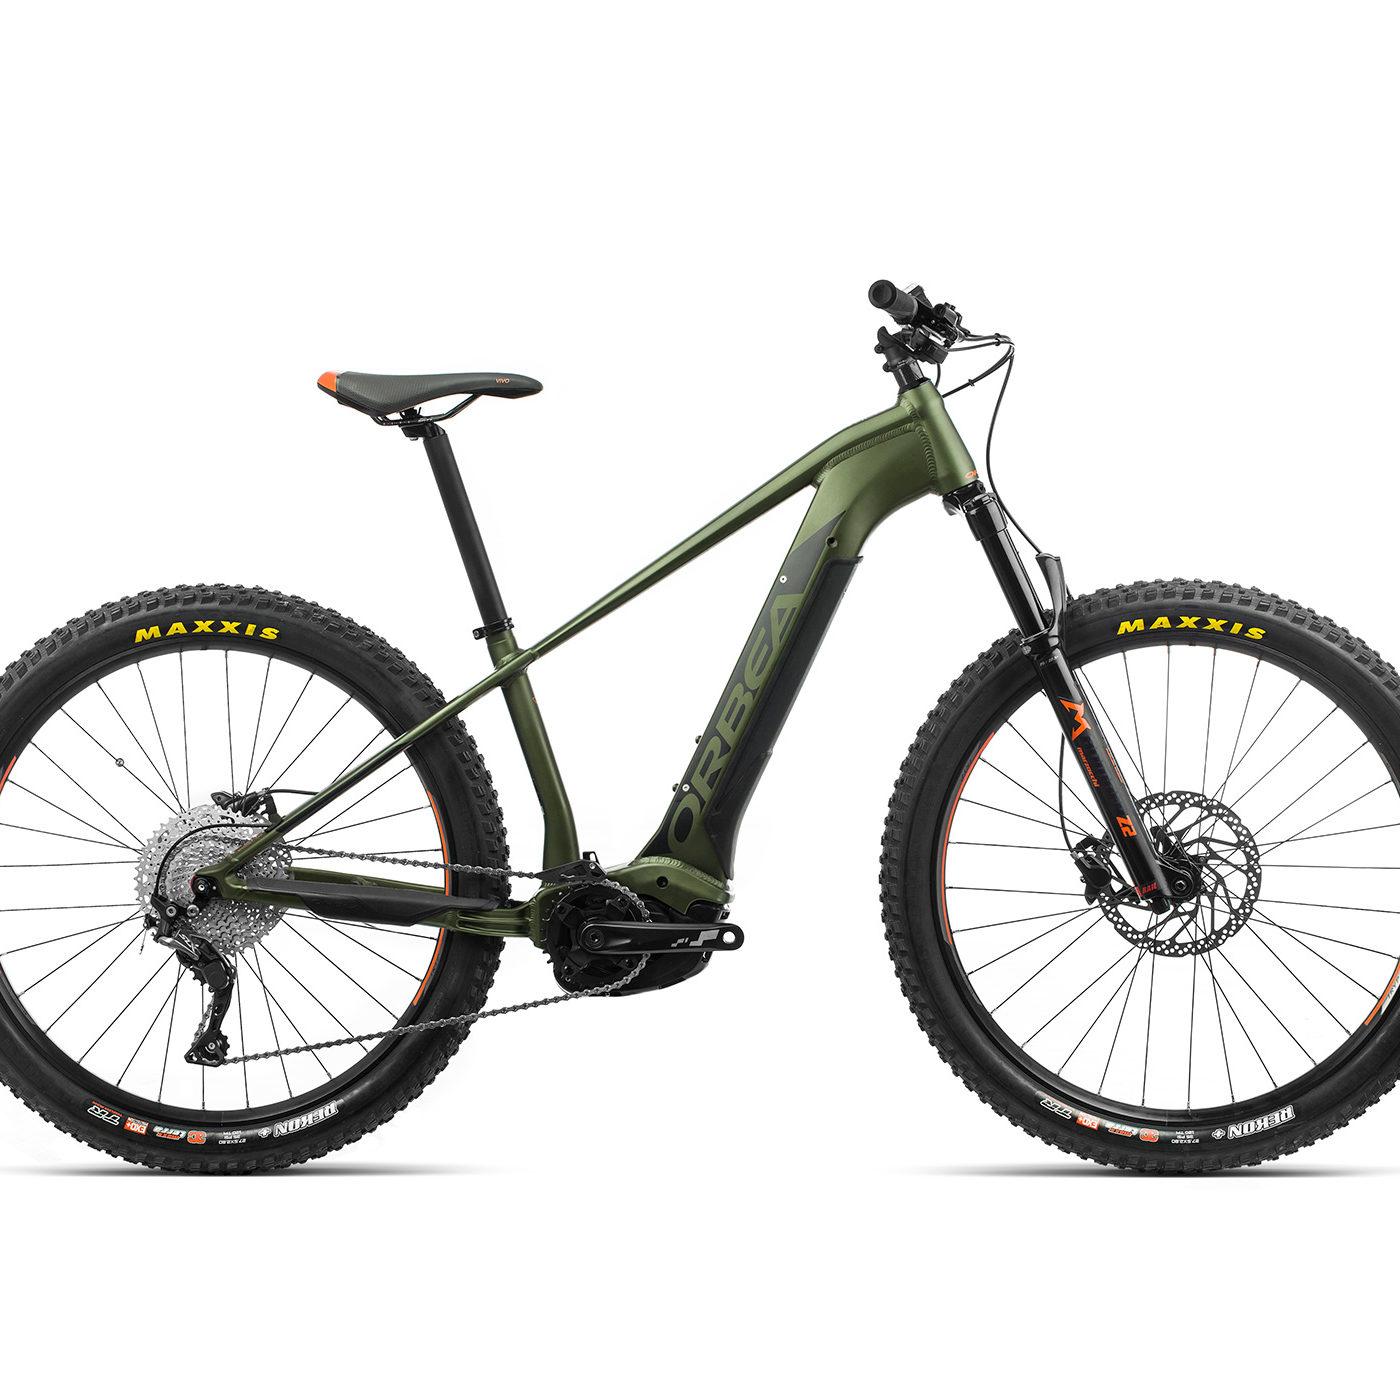 ORBEA WILD HT30 27 ebike - GROEN / ZWART (DOF) @G-Bikes